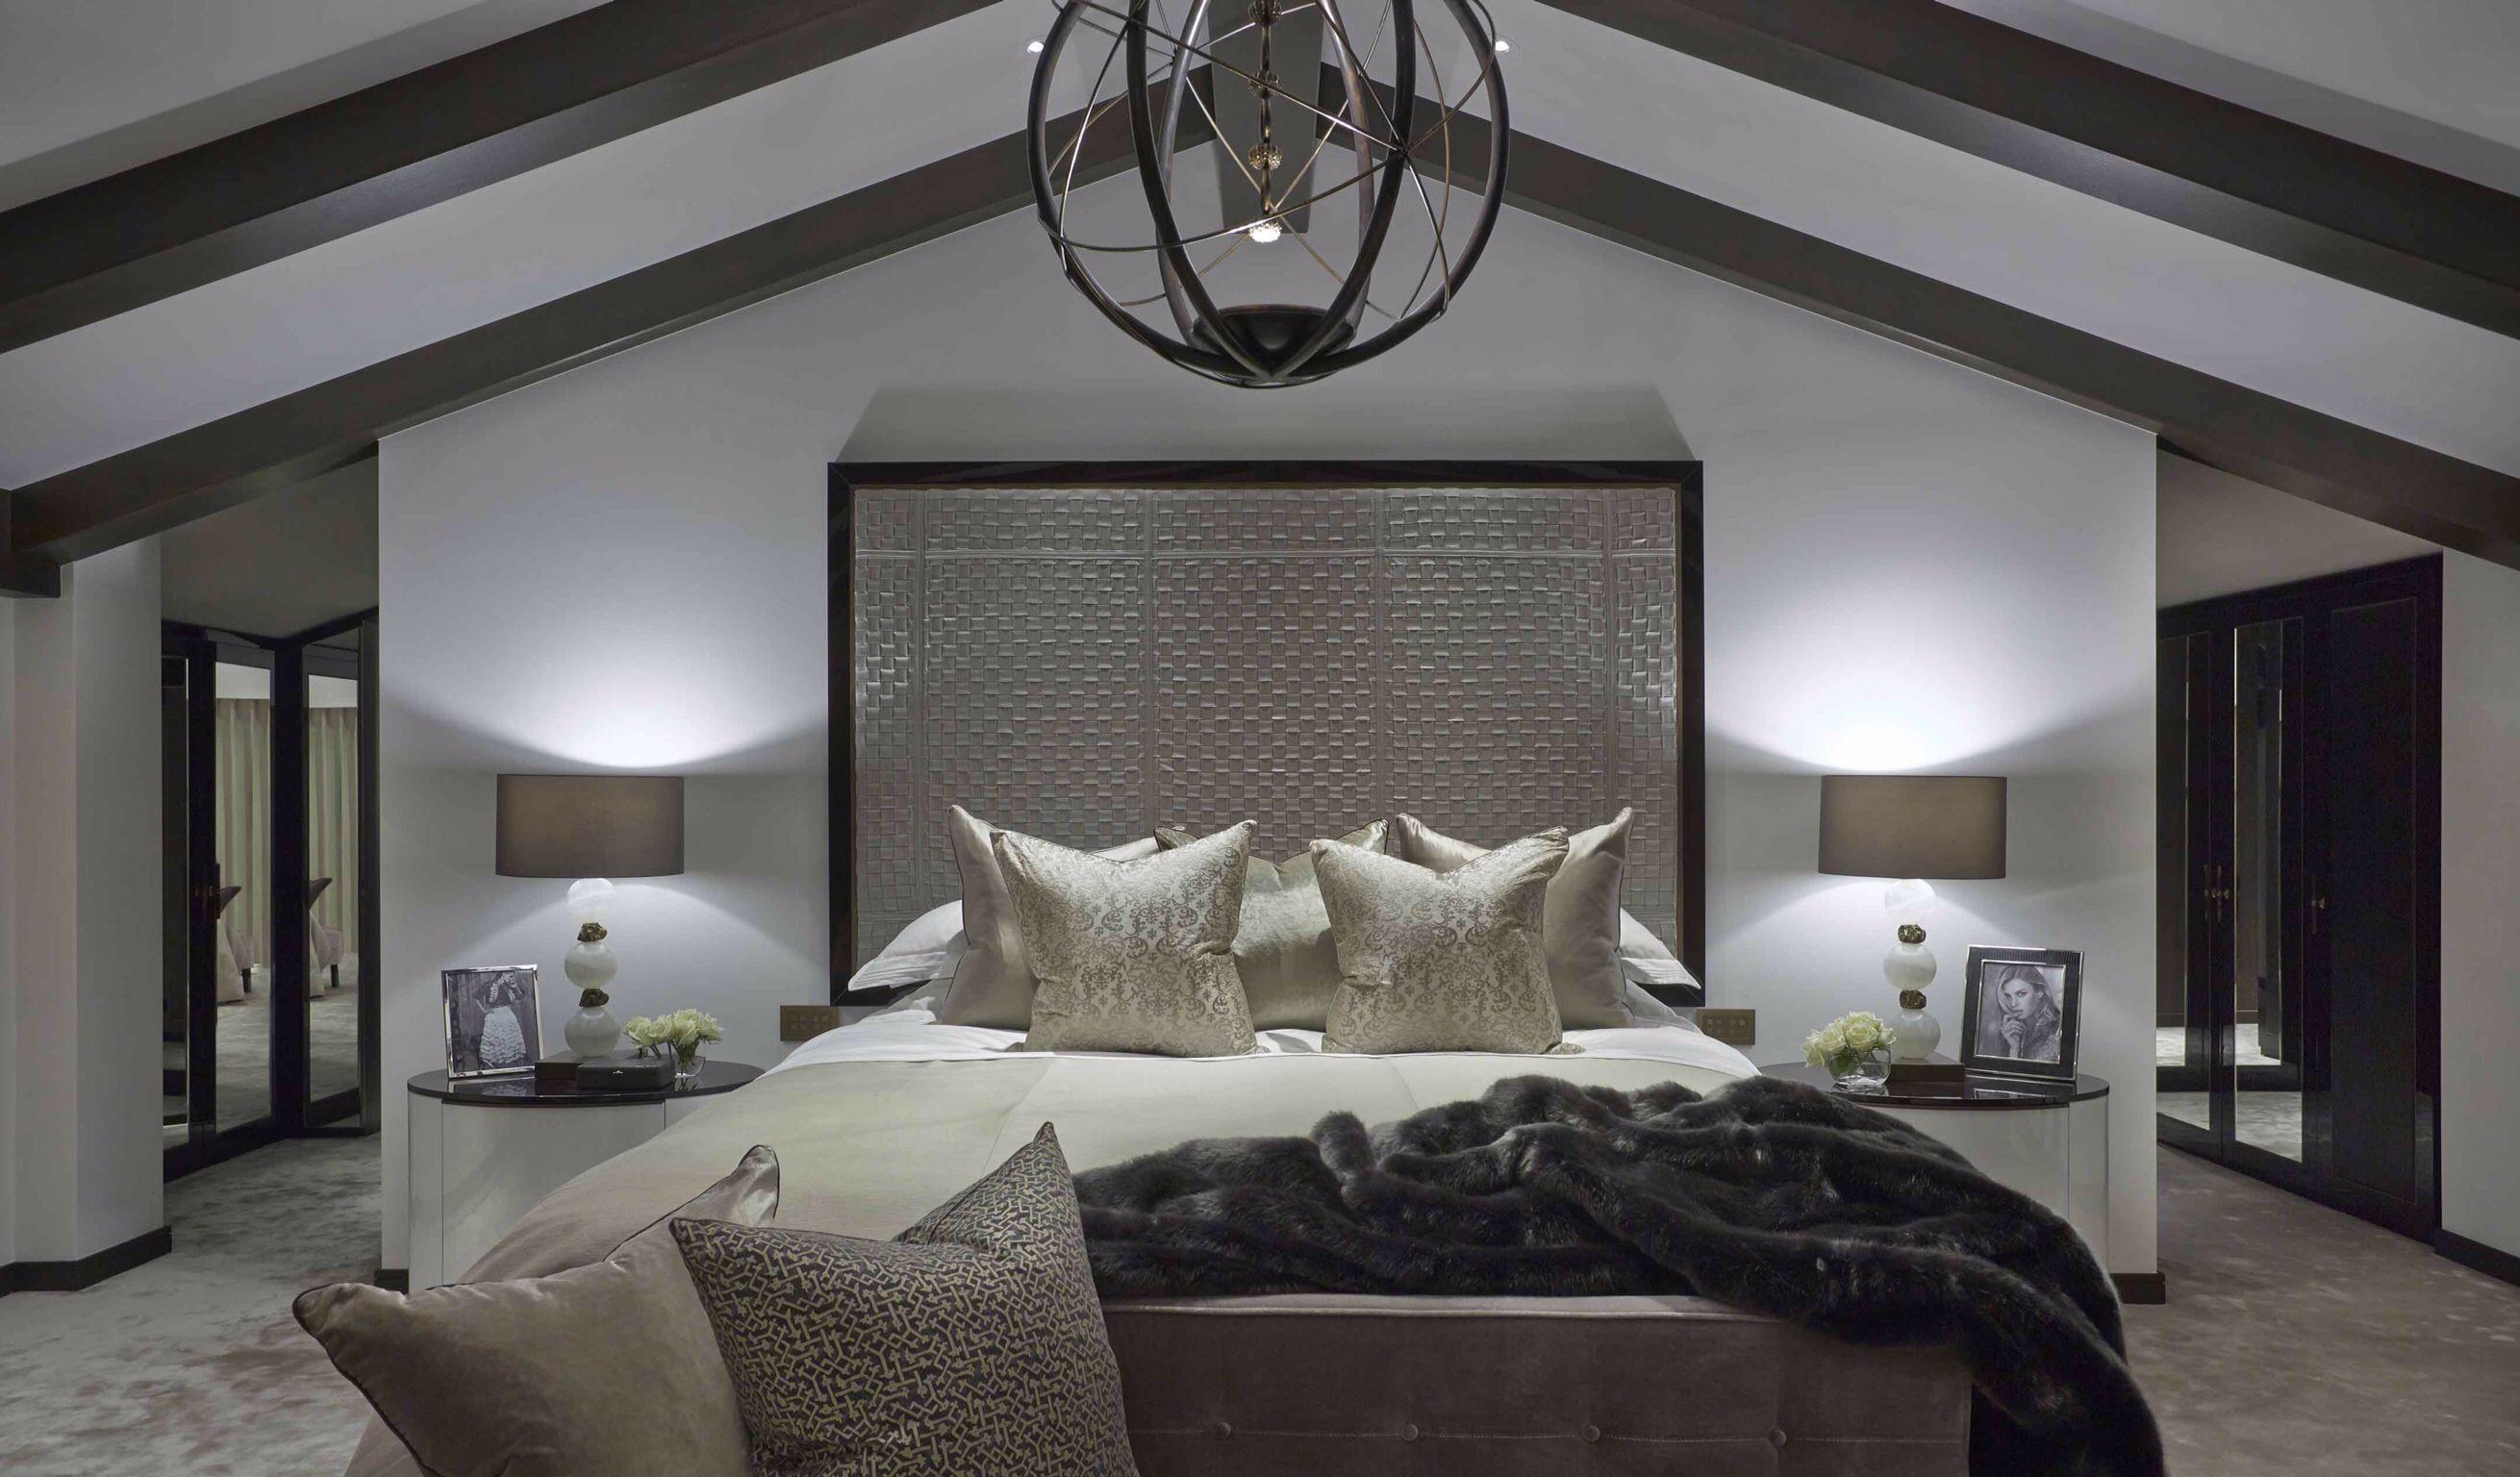 Luxury master bedroom plan  Pin by Emily Nicole on Interiors  Pinterest  Interiors